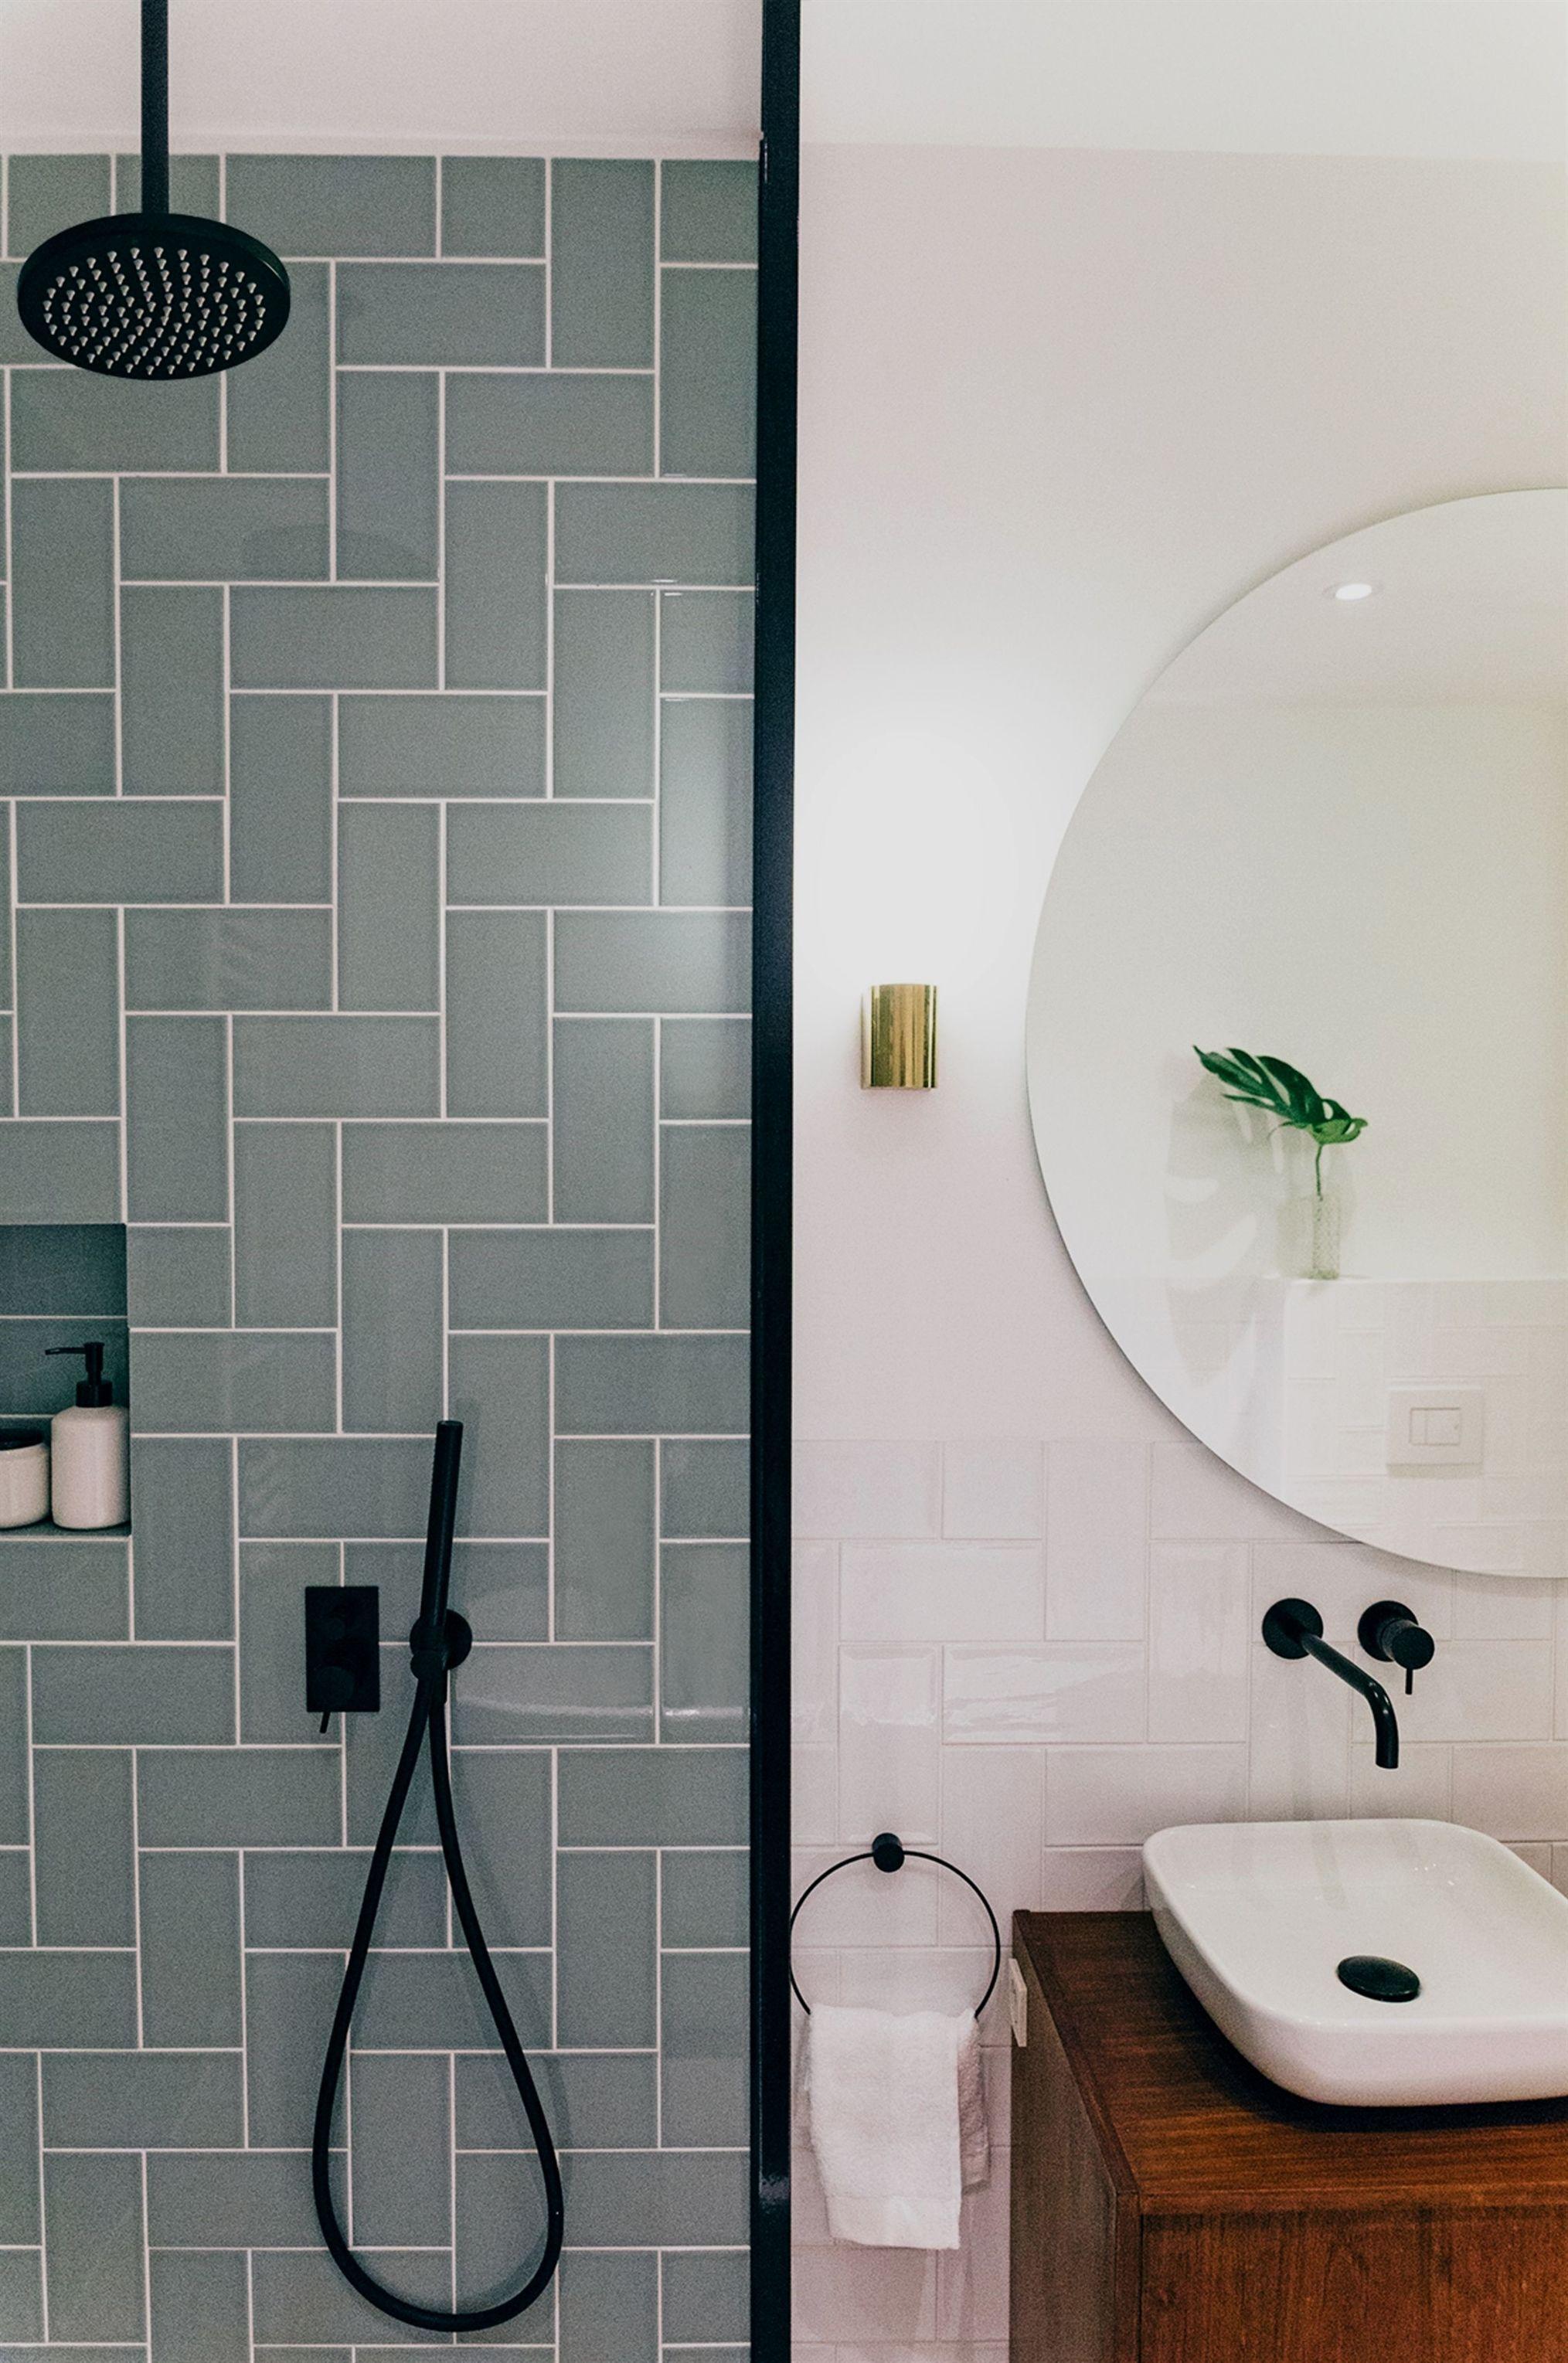 #bathroom decor 1890s #bathroom decor white #bathroom ...